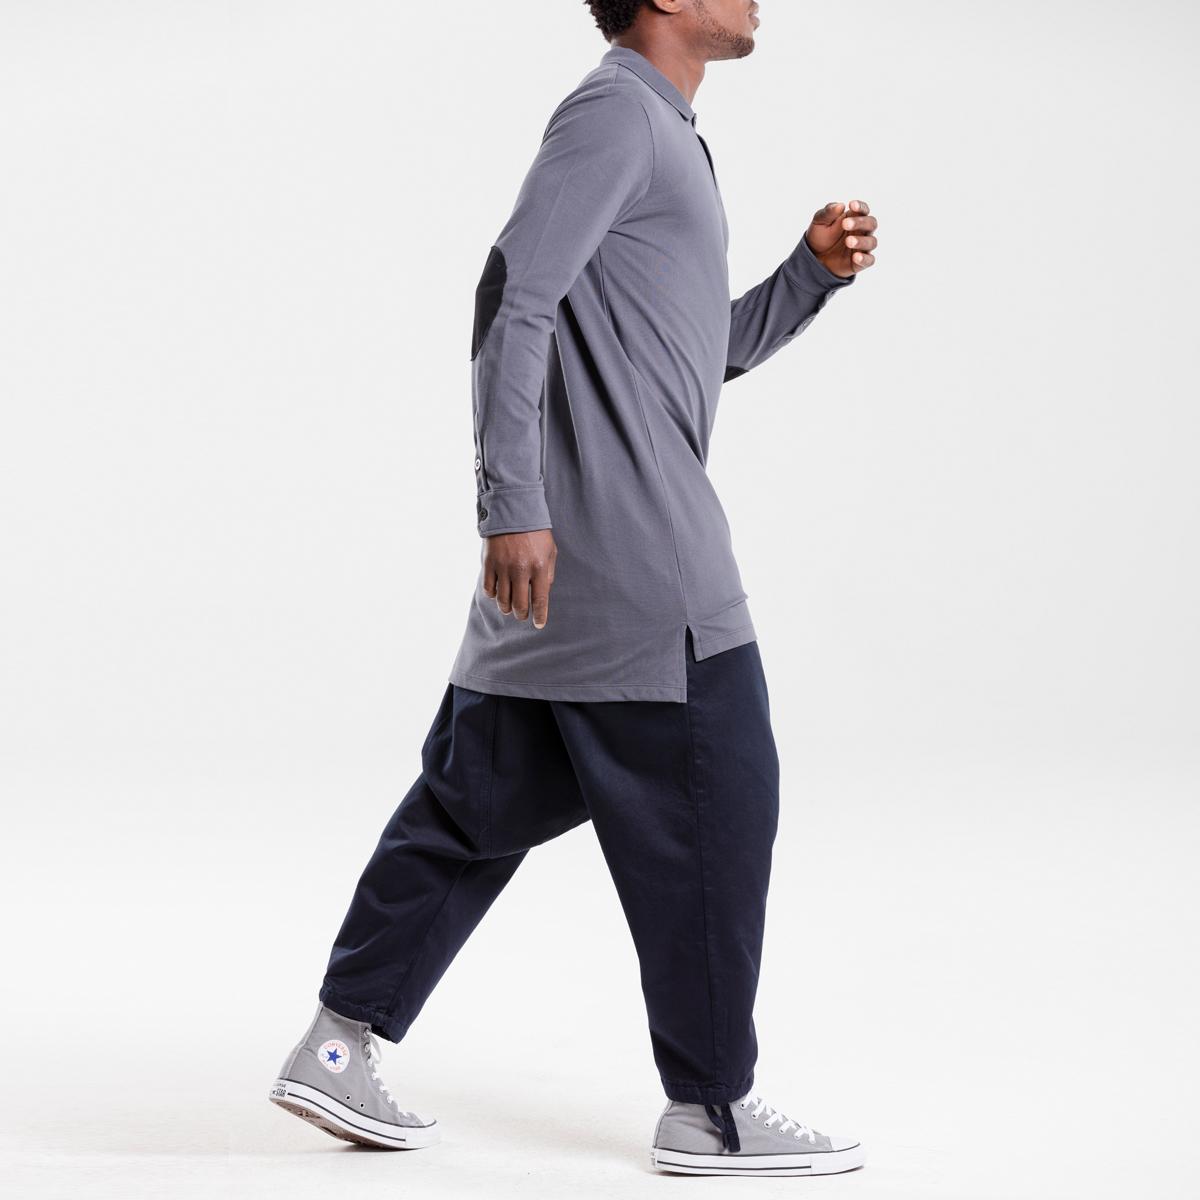 saroual jeans evo marine dcjeans ensemble profil